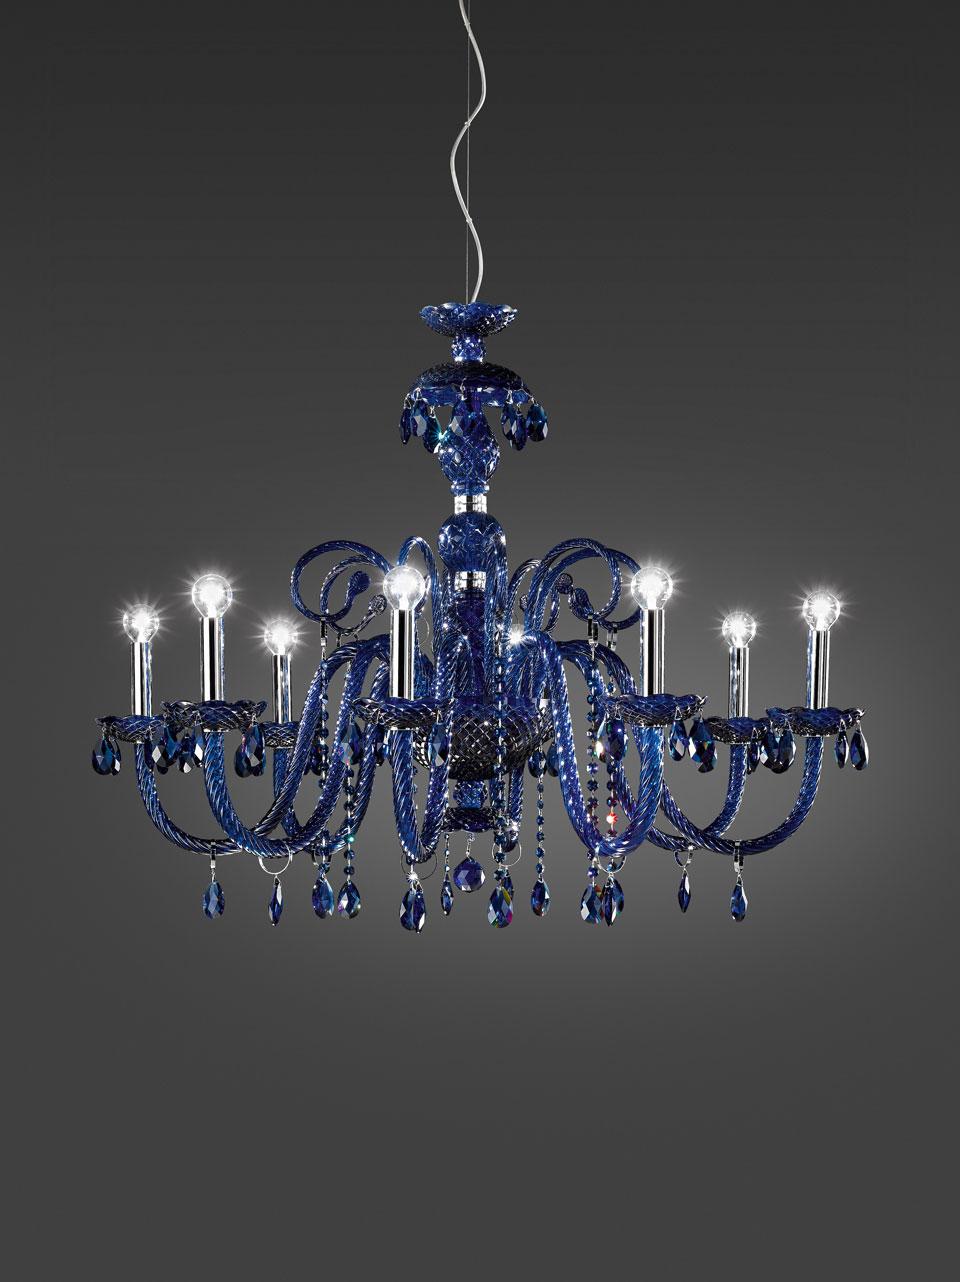 Evergreen lustre bleu en cristal 8 lumières et pampilles en verre bleu. Italamp.